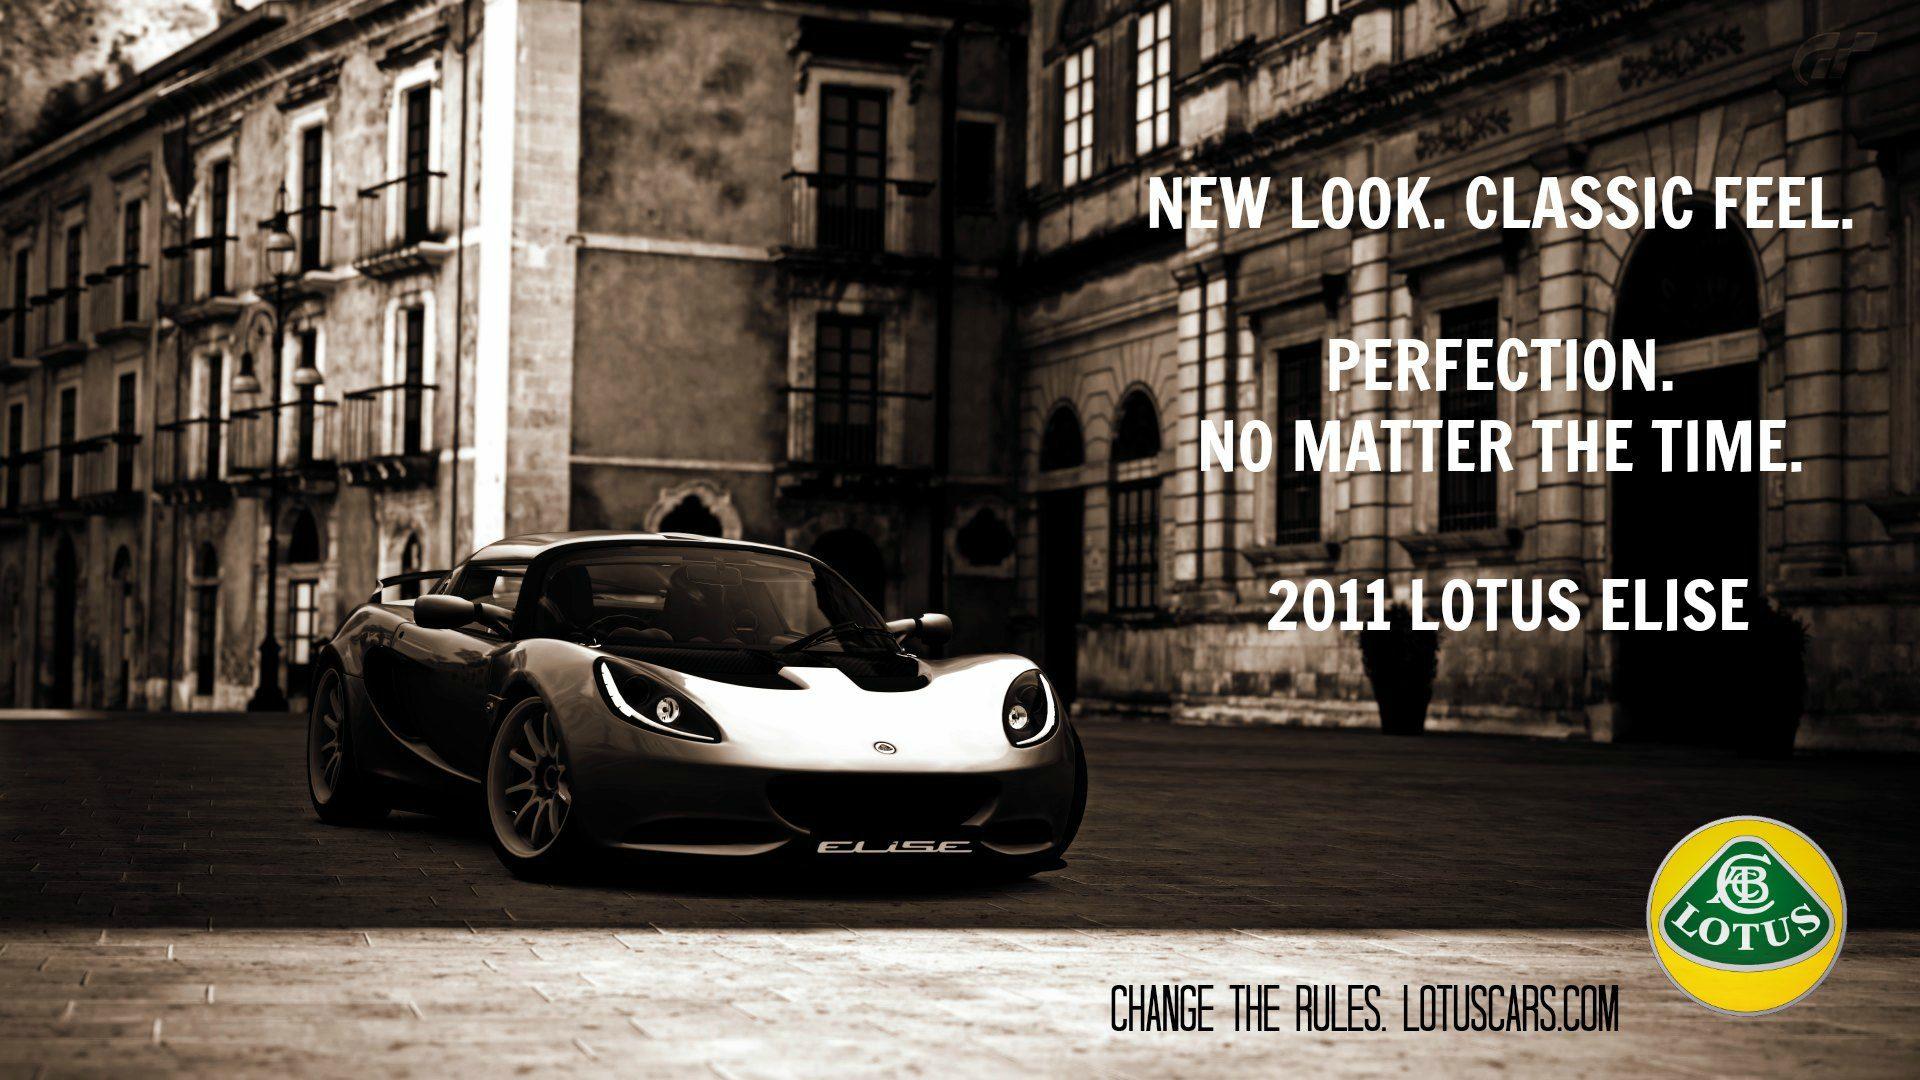 Lotus ad.jpg